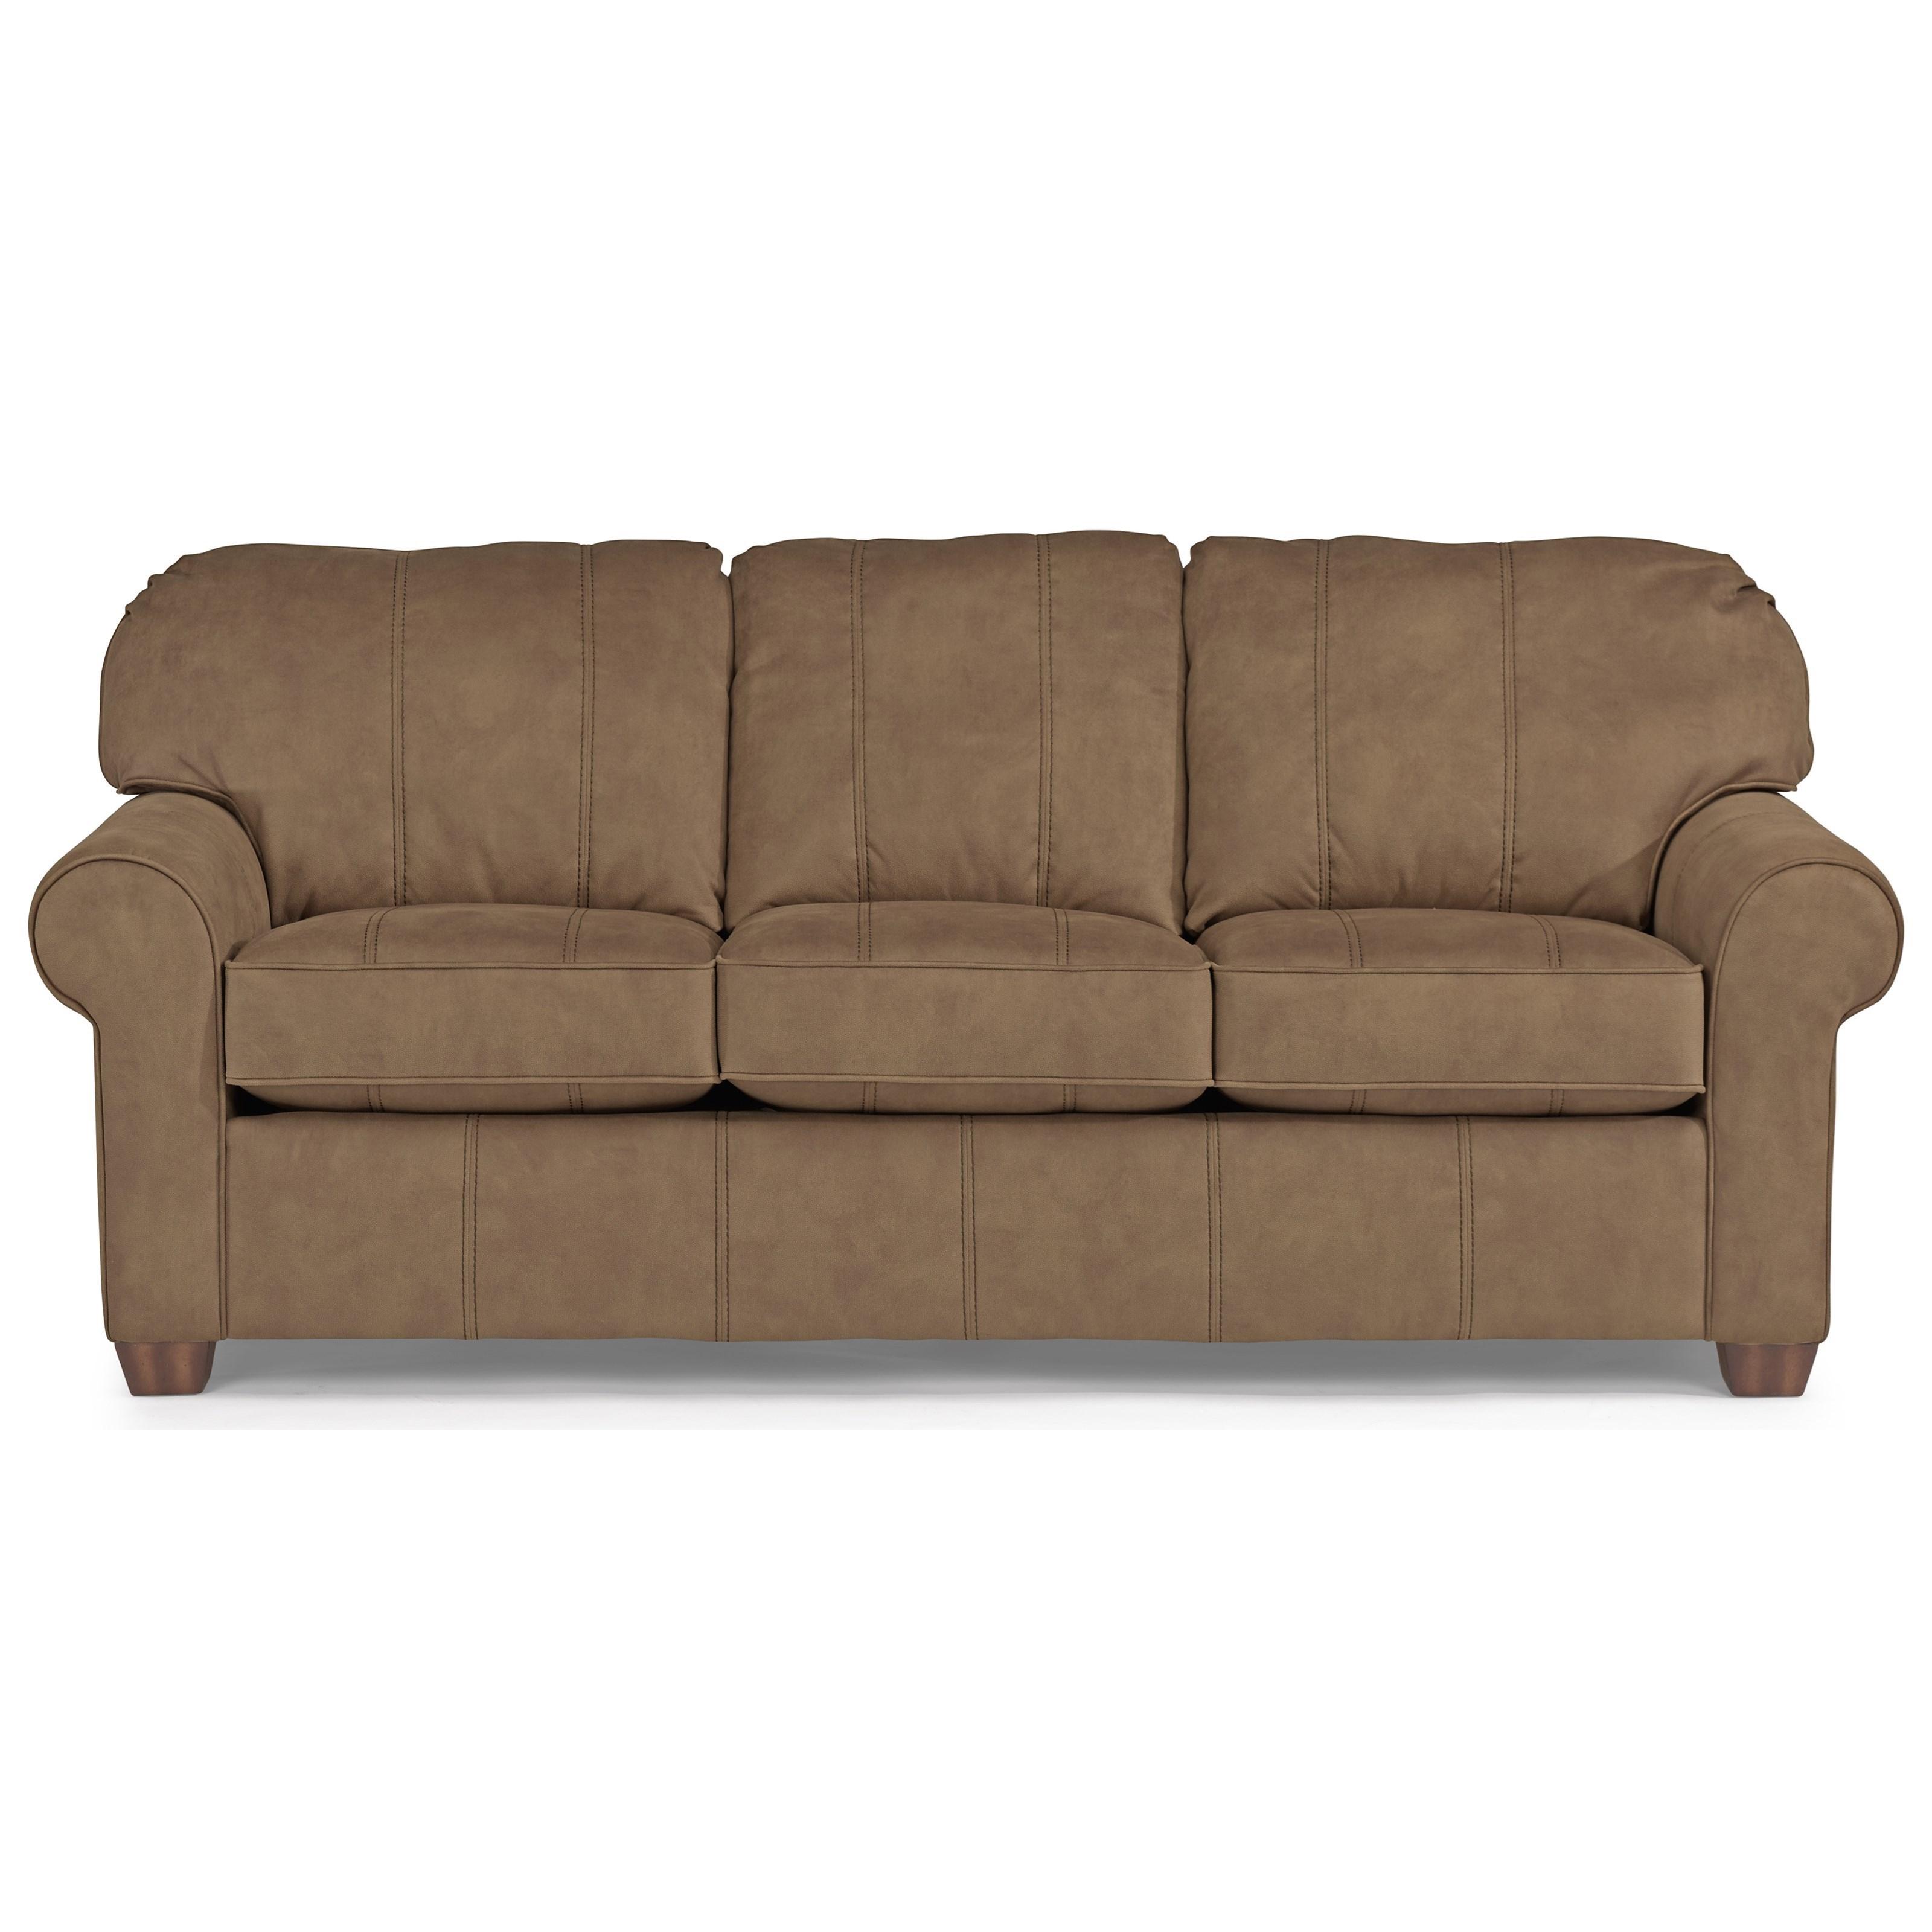 Flexsteel Sofa Bed Mattress: Flexsteel Paige Stationary Upholstered Sofa